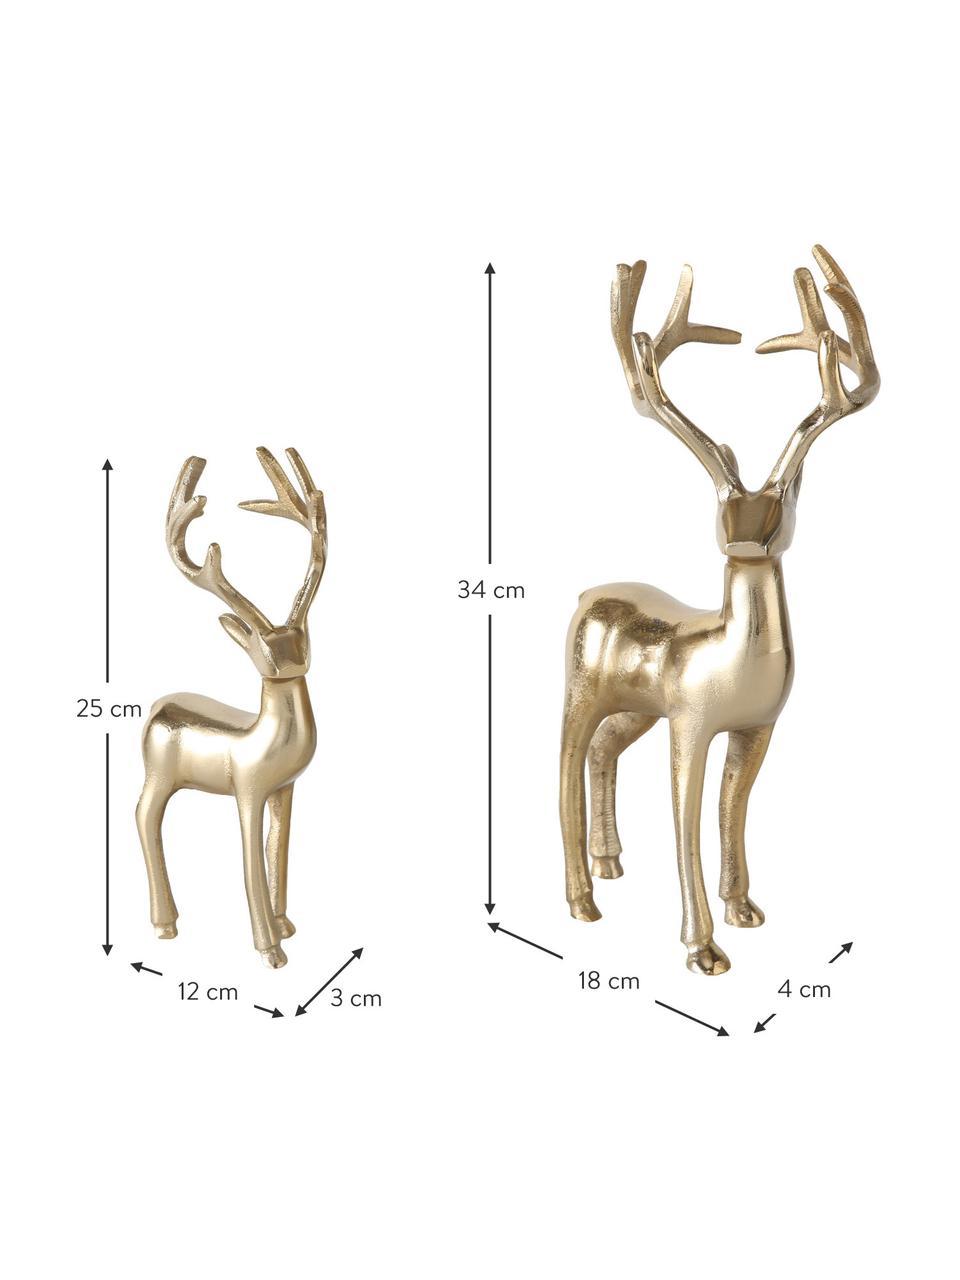 Deko-Hirsche Thielo in Gold, 2 Stück, Aluminium, beschichtet, Messingfarben, Sondergrößen